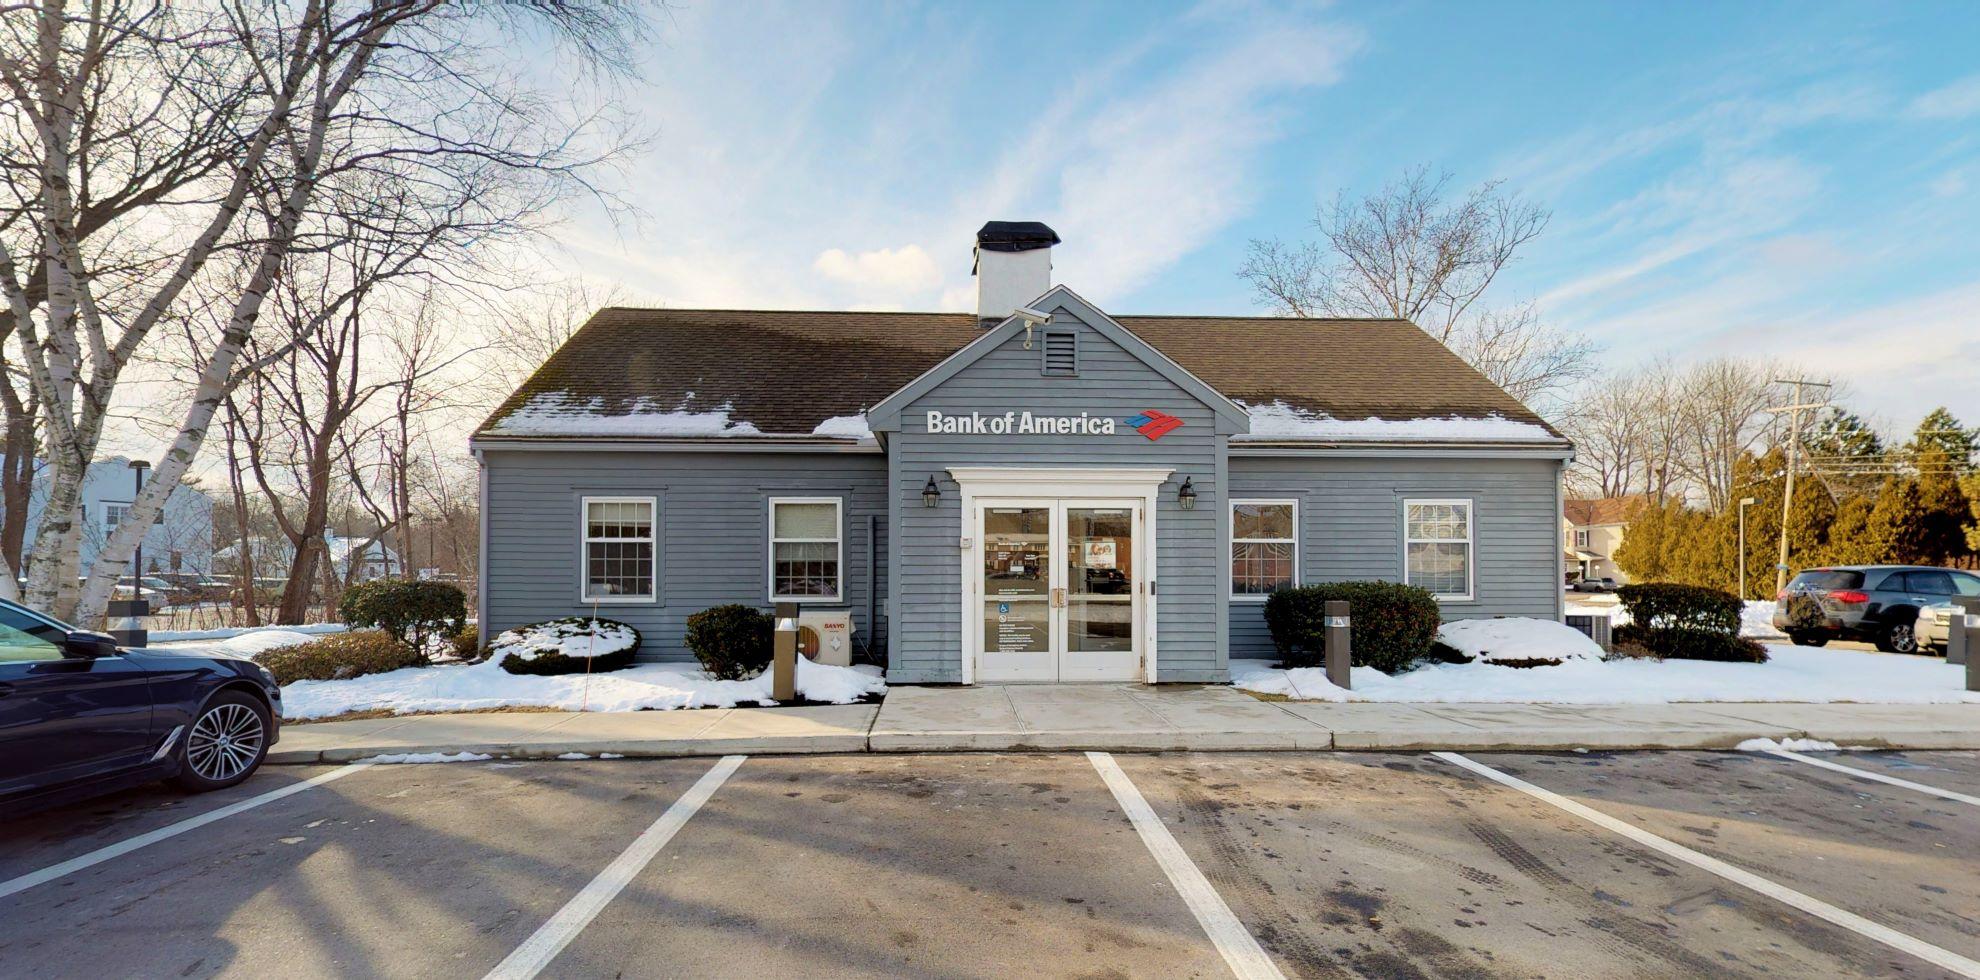 Bank of America financial center with drive-thru ATM   264 Lafayette Rd, Hampton, NH 03842